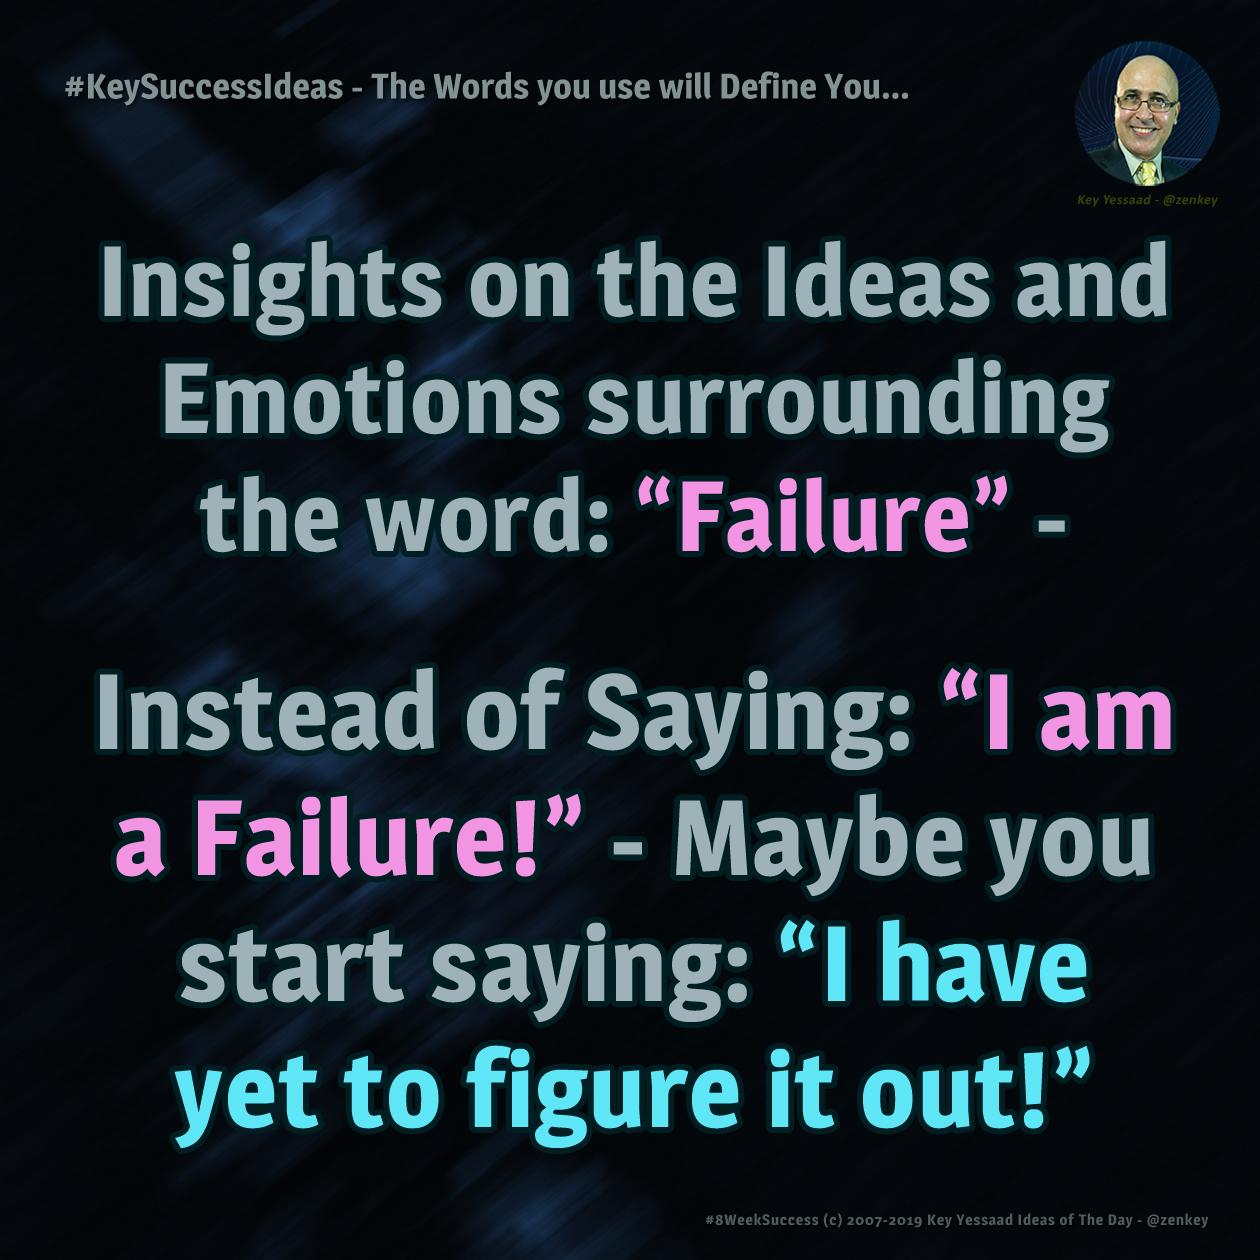 #KeySuccessIdeas - The Words you use will Define You...